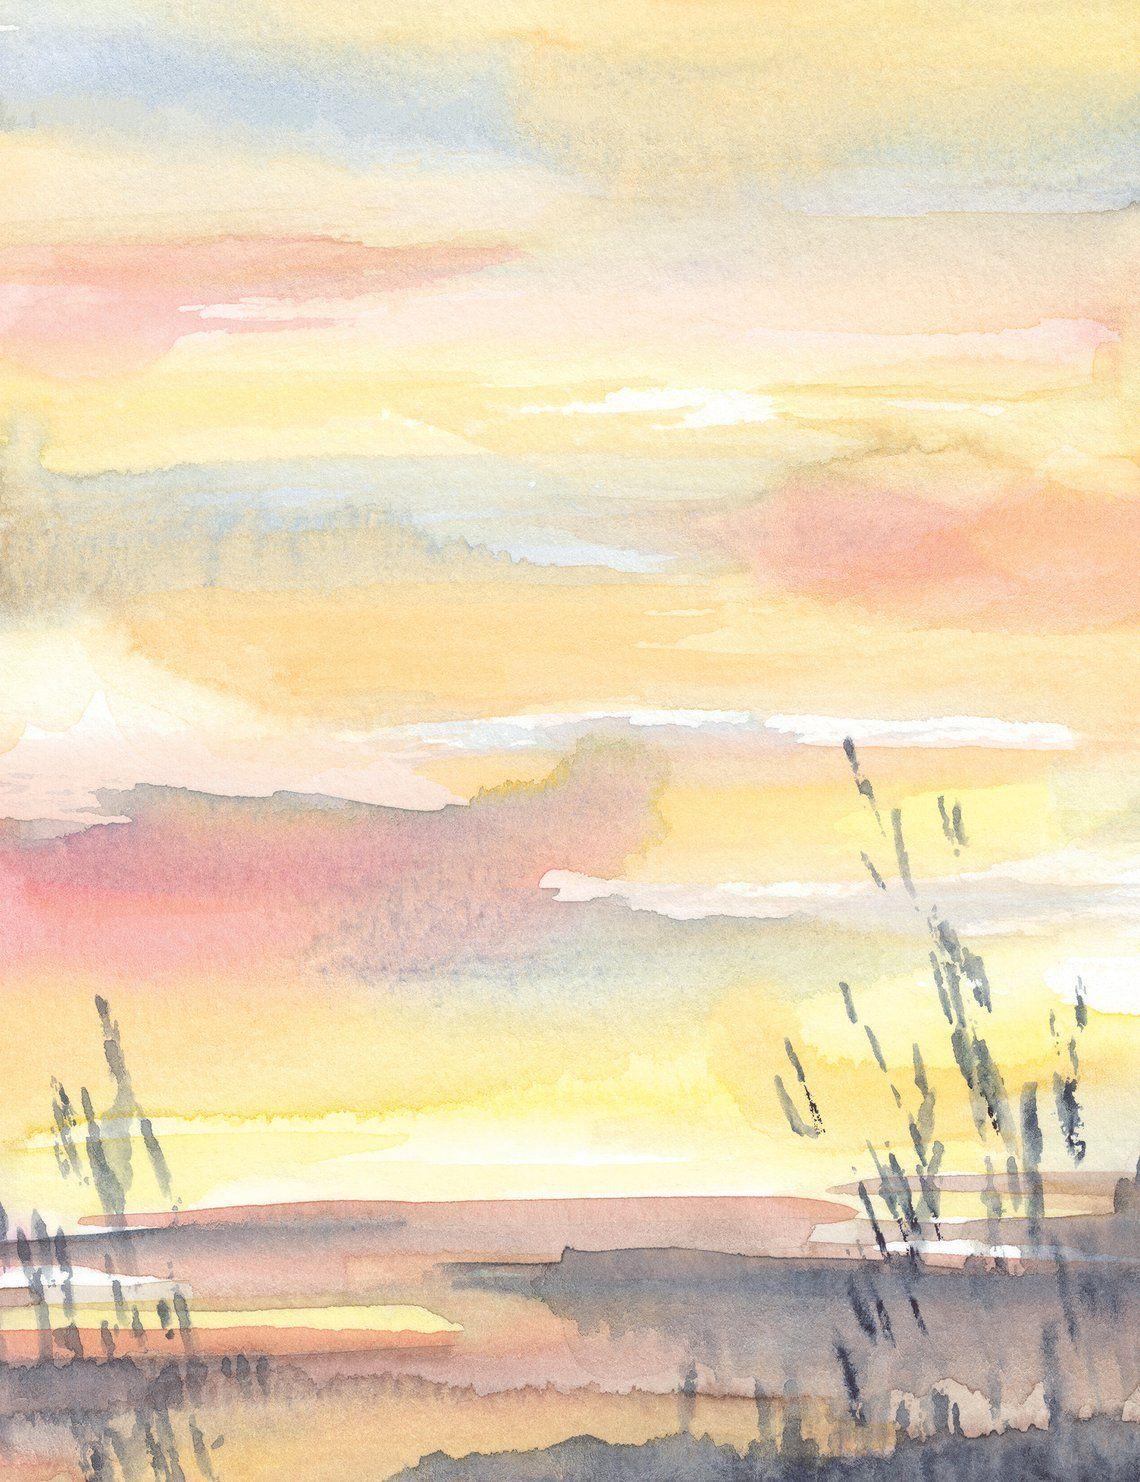 Abstract Sunset Watercolor Landscape Art Print Sunrise Wall Etsy Watercolor Sunset Sunrise Art Watercolor Sunrise